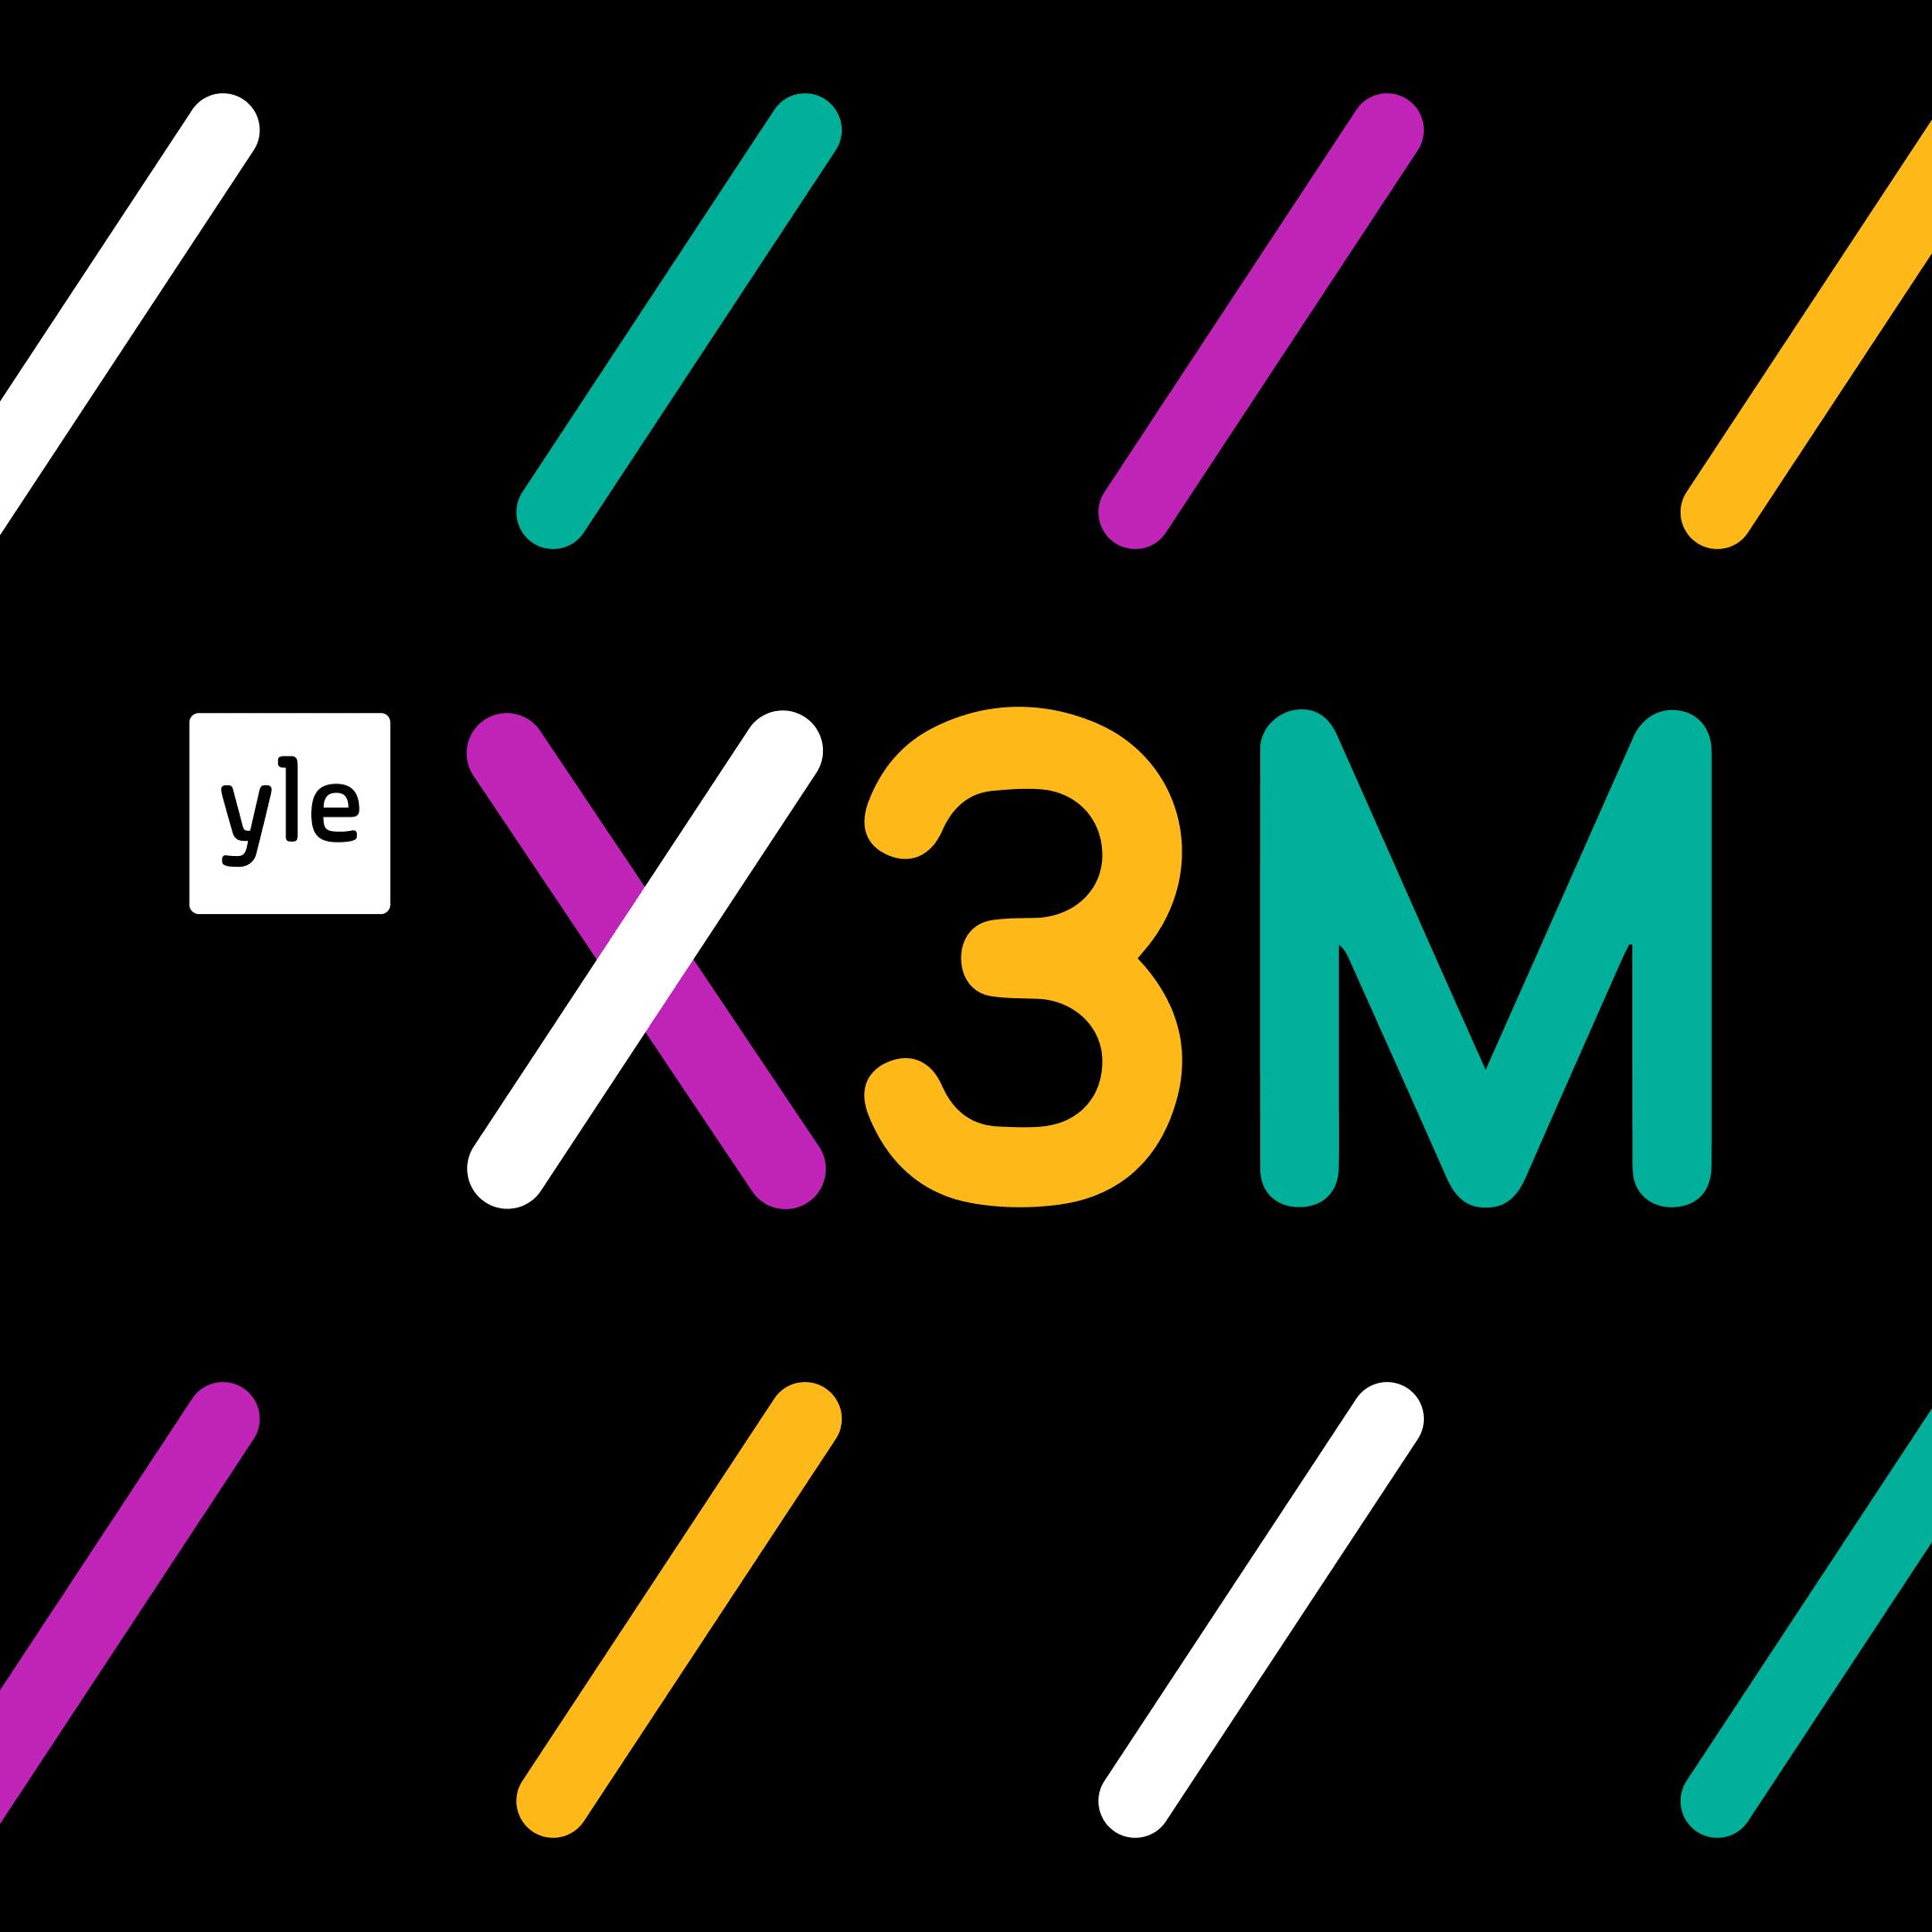 X3m Live